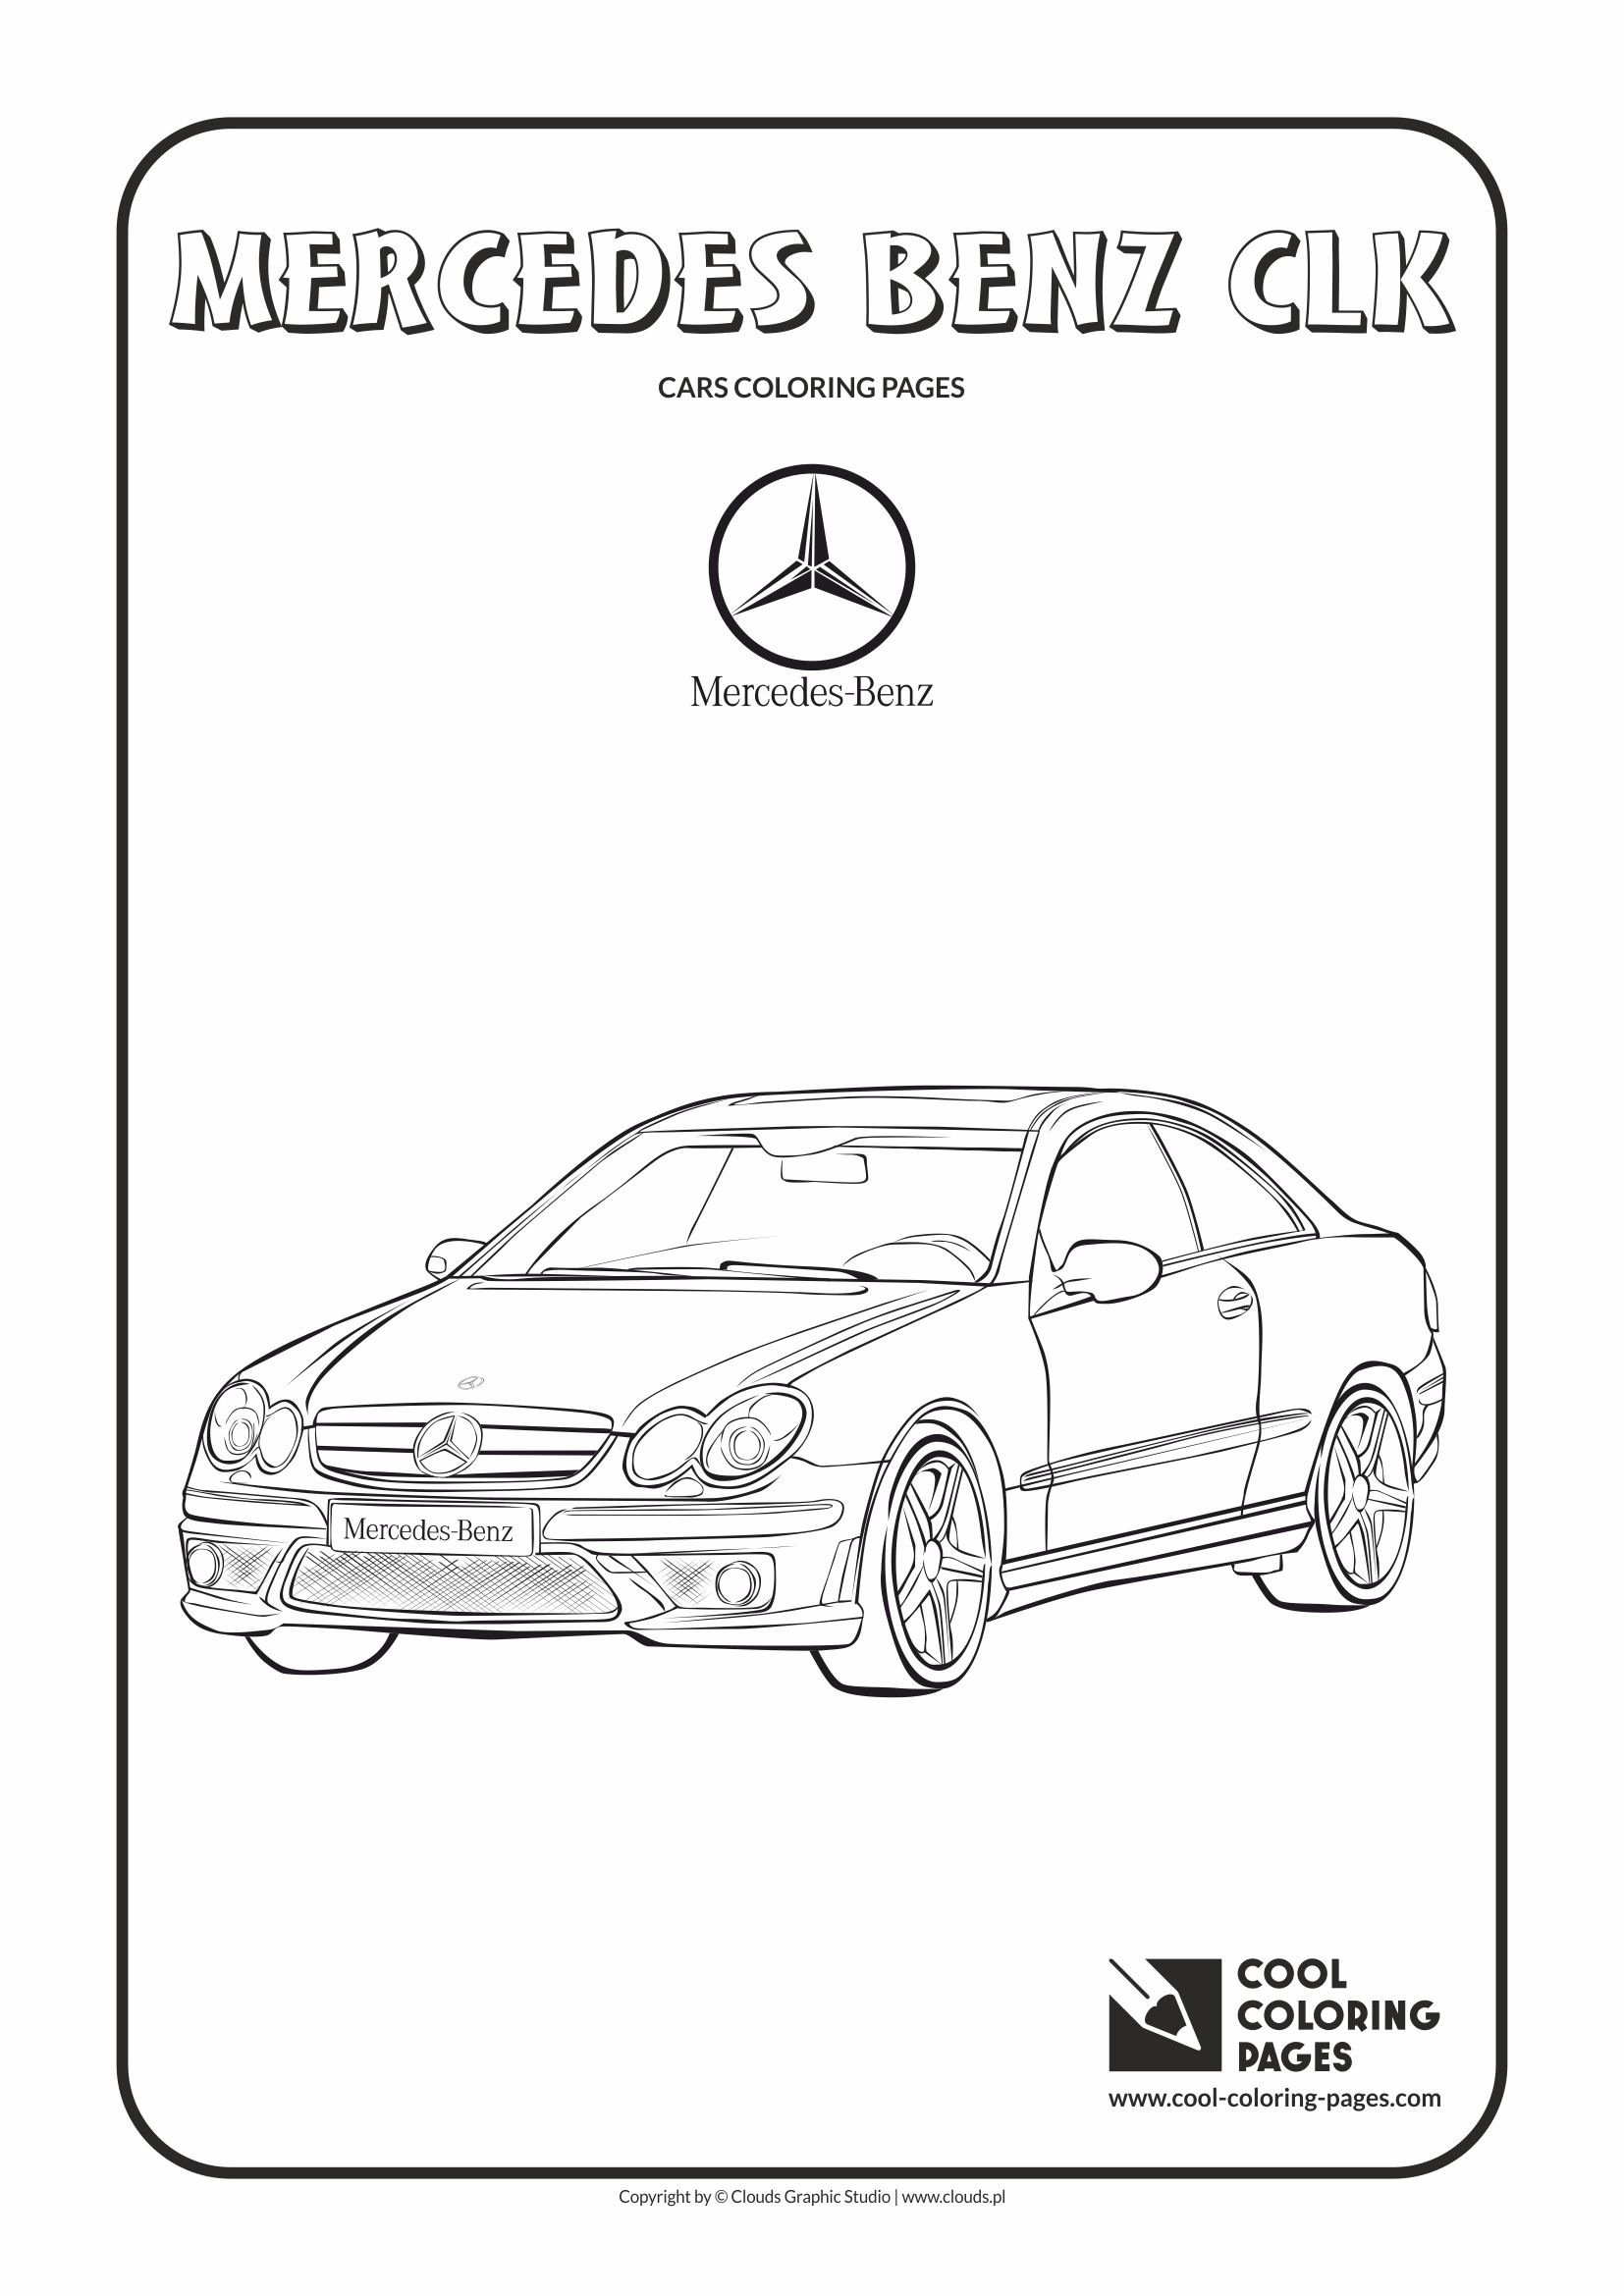 Cool Coloring Pages Cars Coloring Pages Cool Coloring